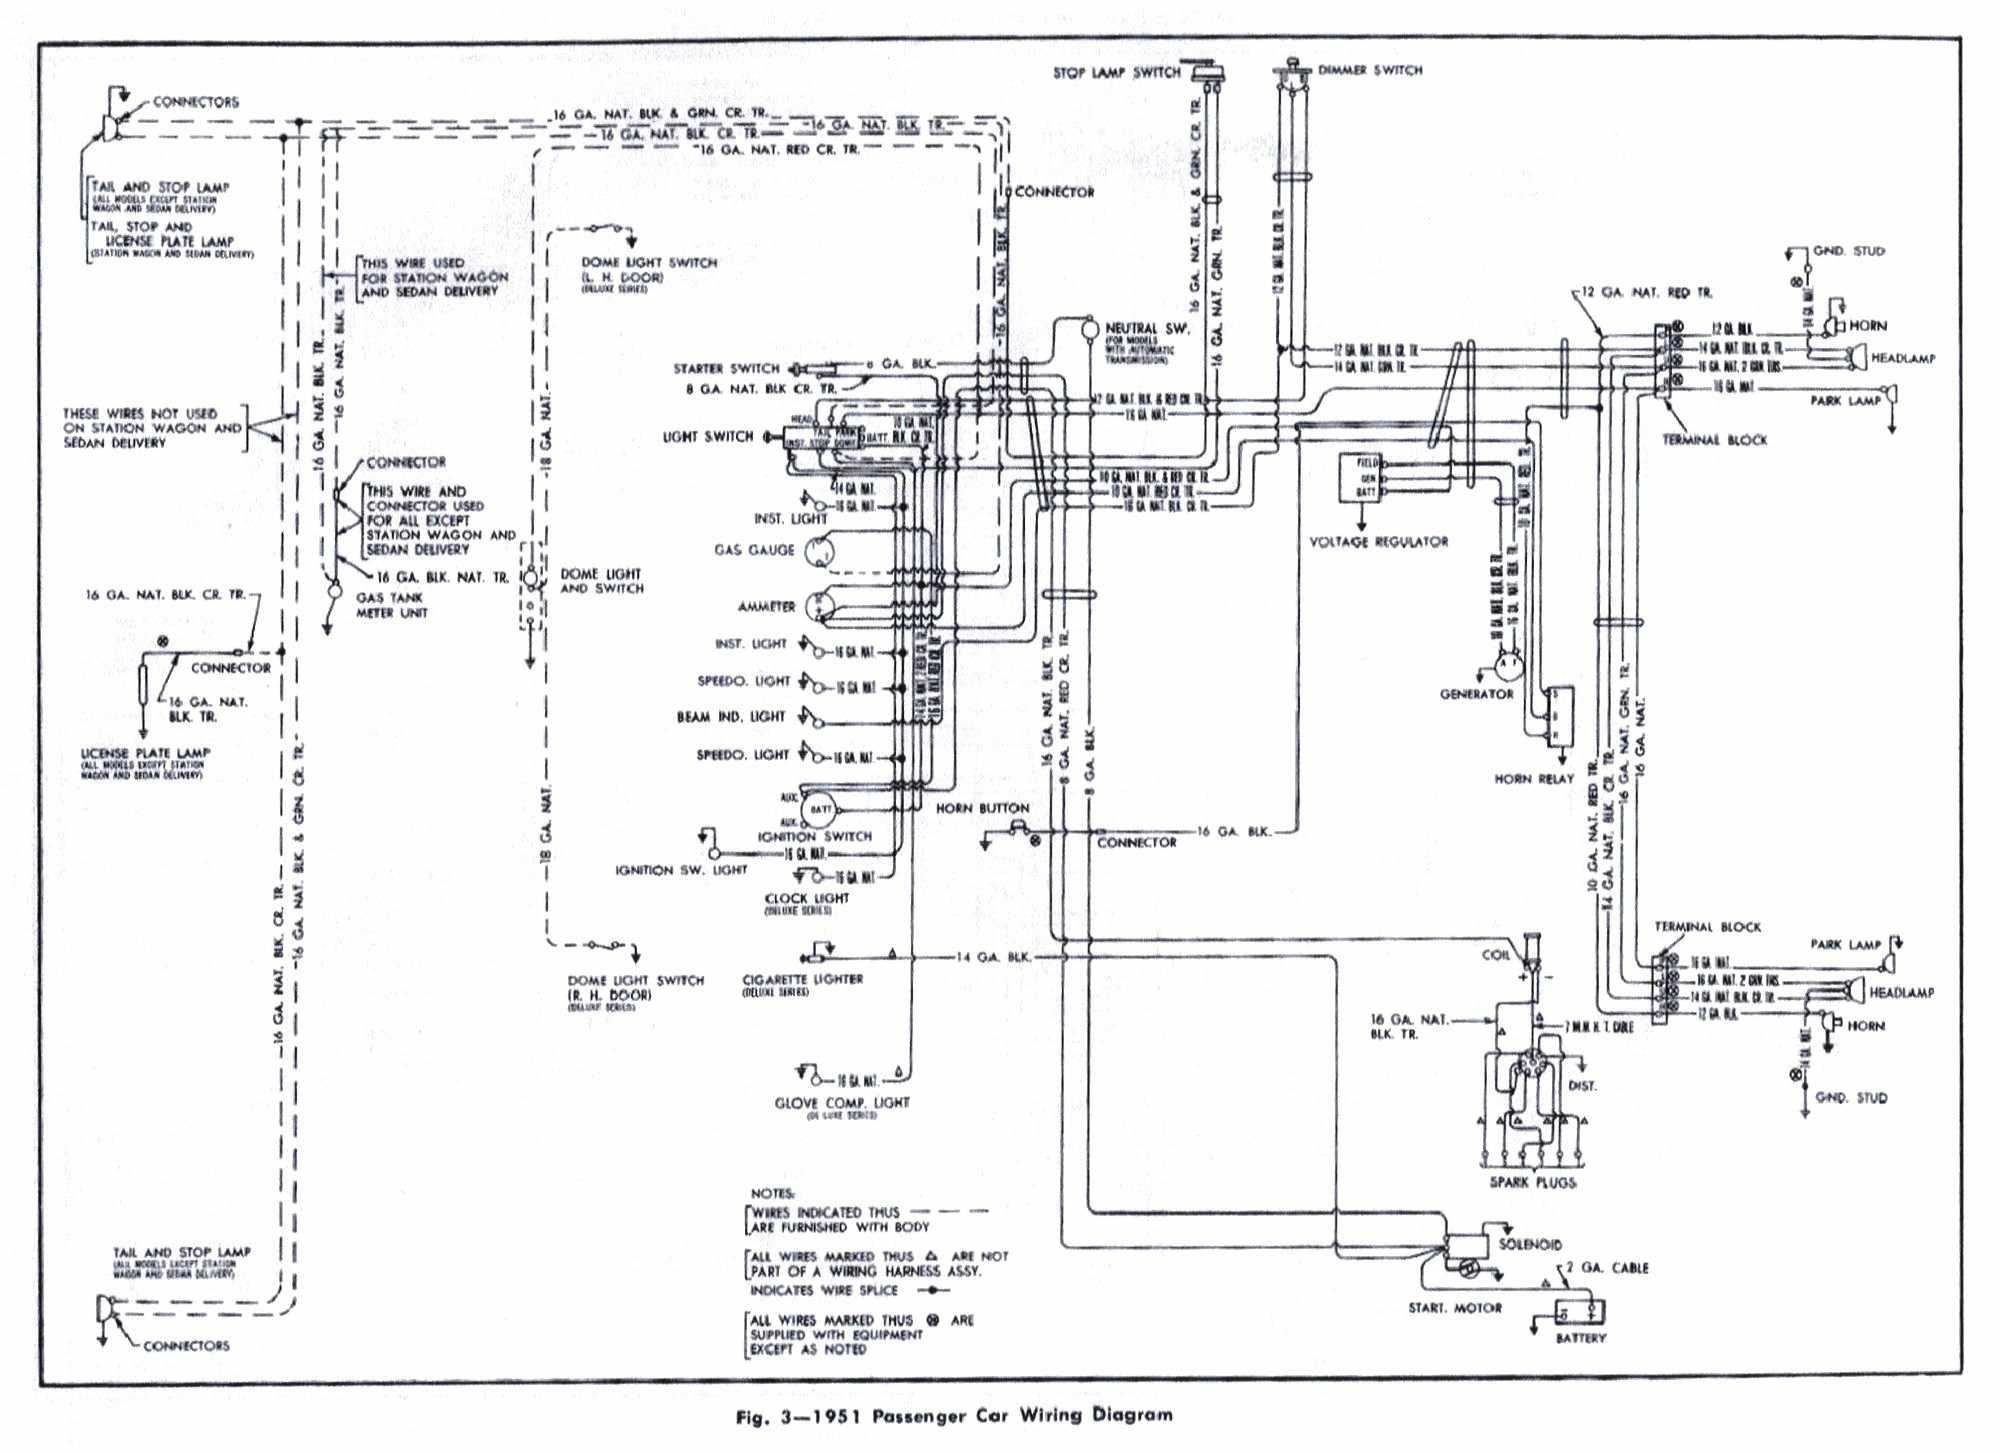 S10 Wiring Diagram Pdf - Wiring Diagram Data Oreo